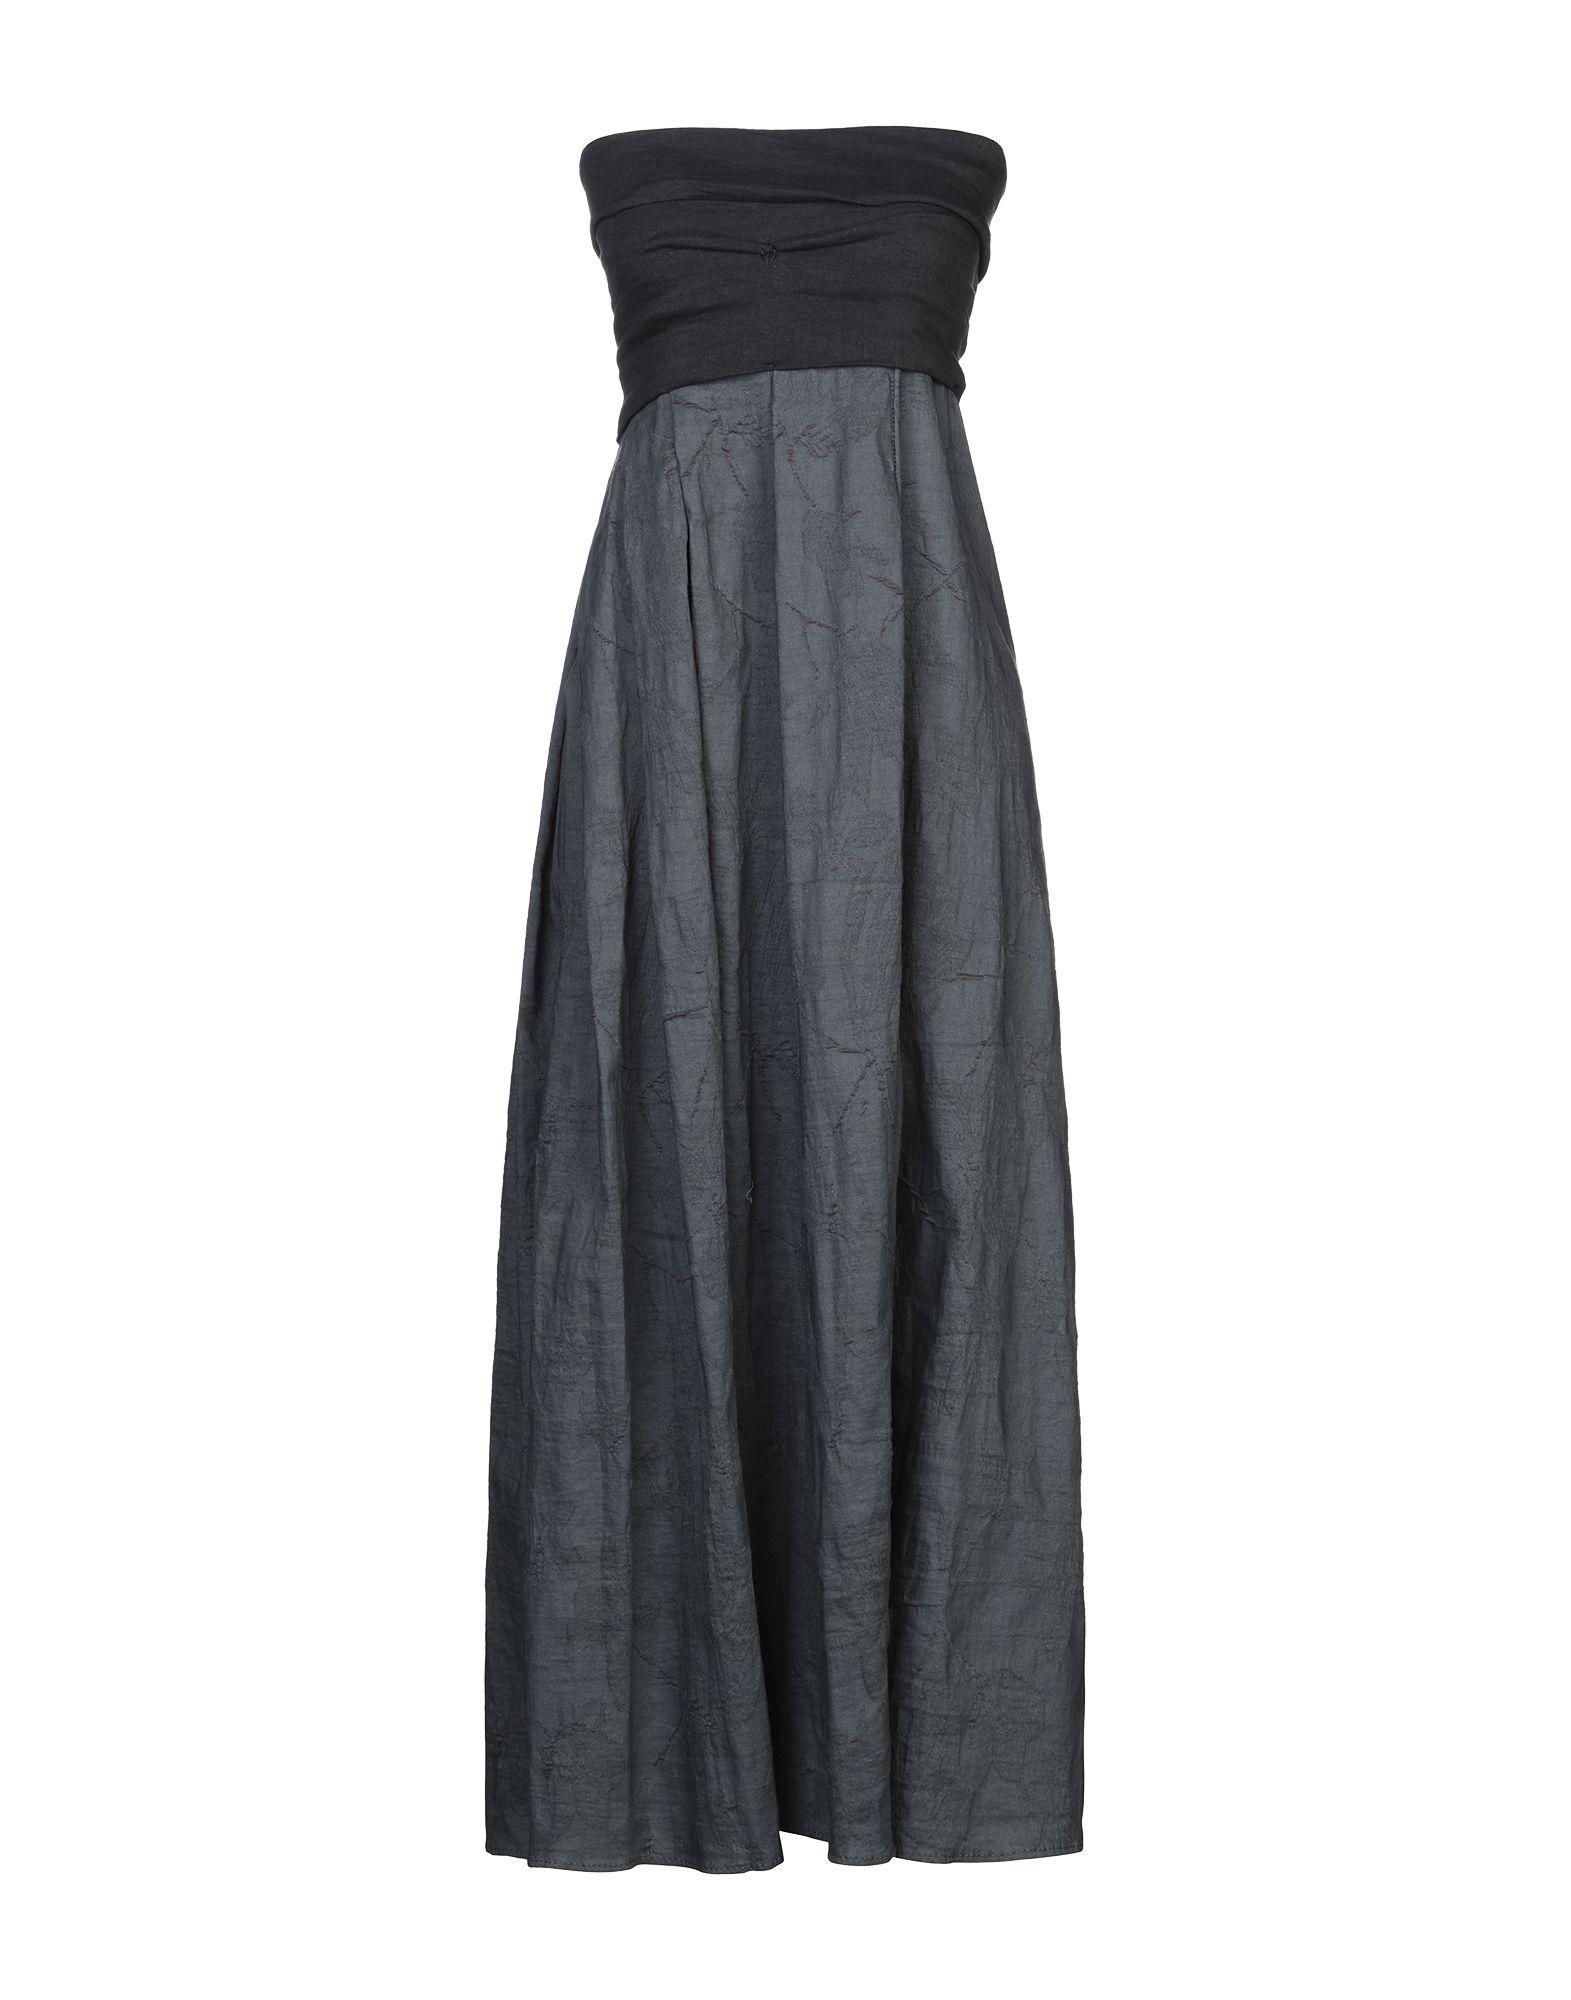 SIMONA TAGLIAFERRI Платье длиной 3/4